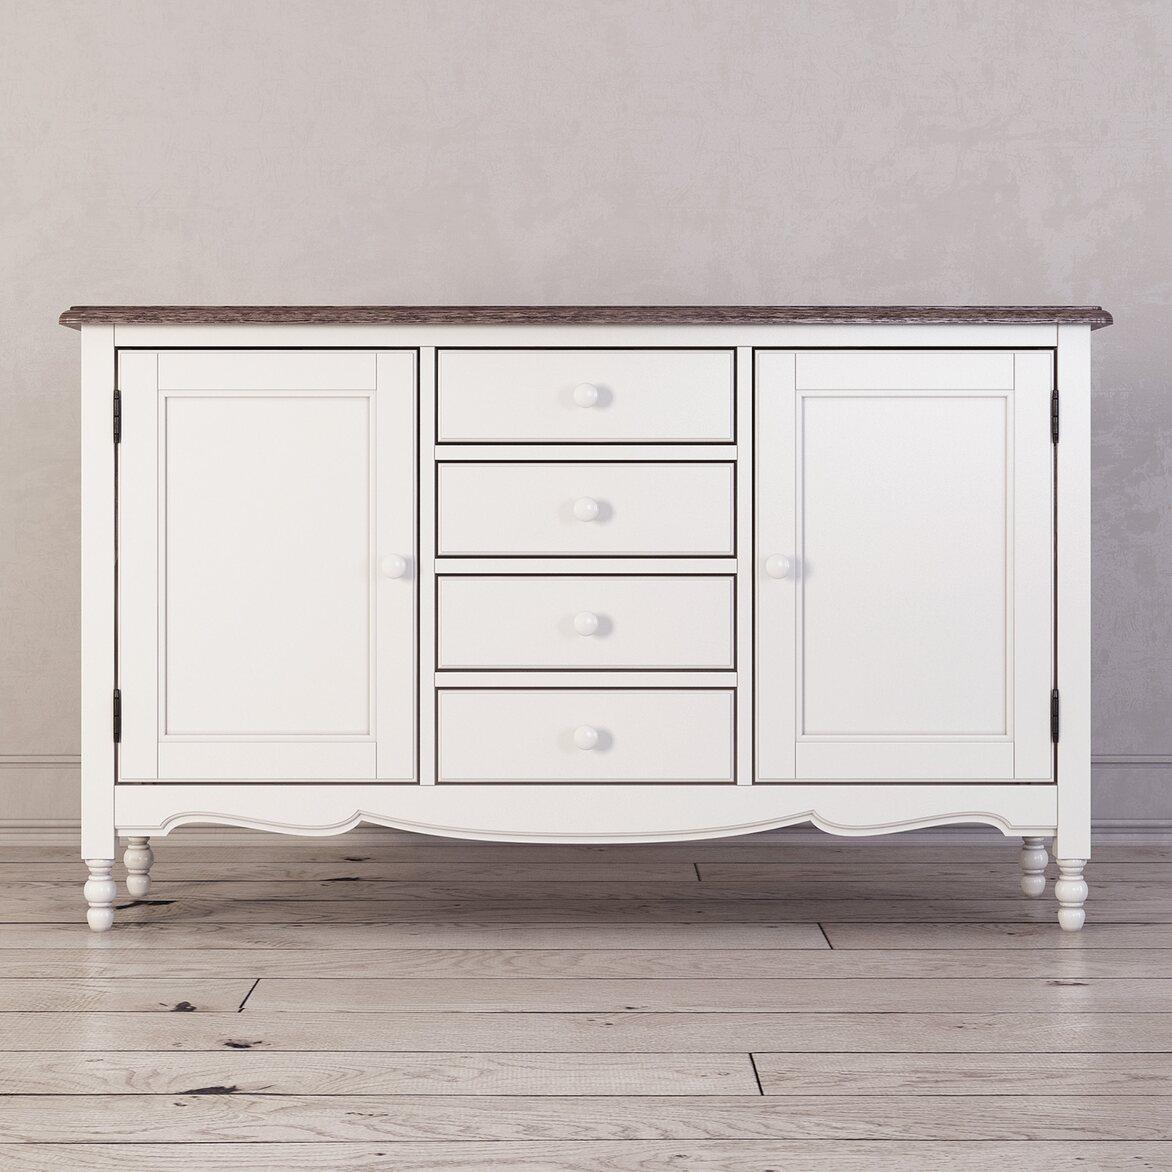 Буфет двухстворчатый с 4-я ящиками Leblanc, белый | Буфеты Kingsby